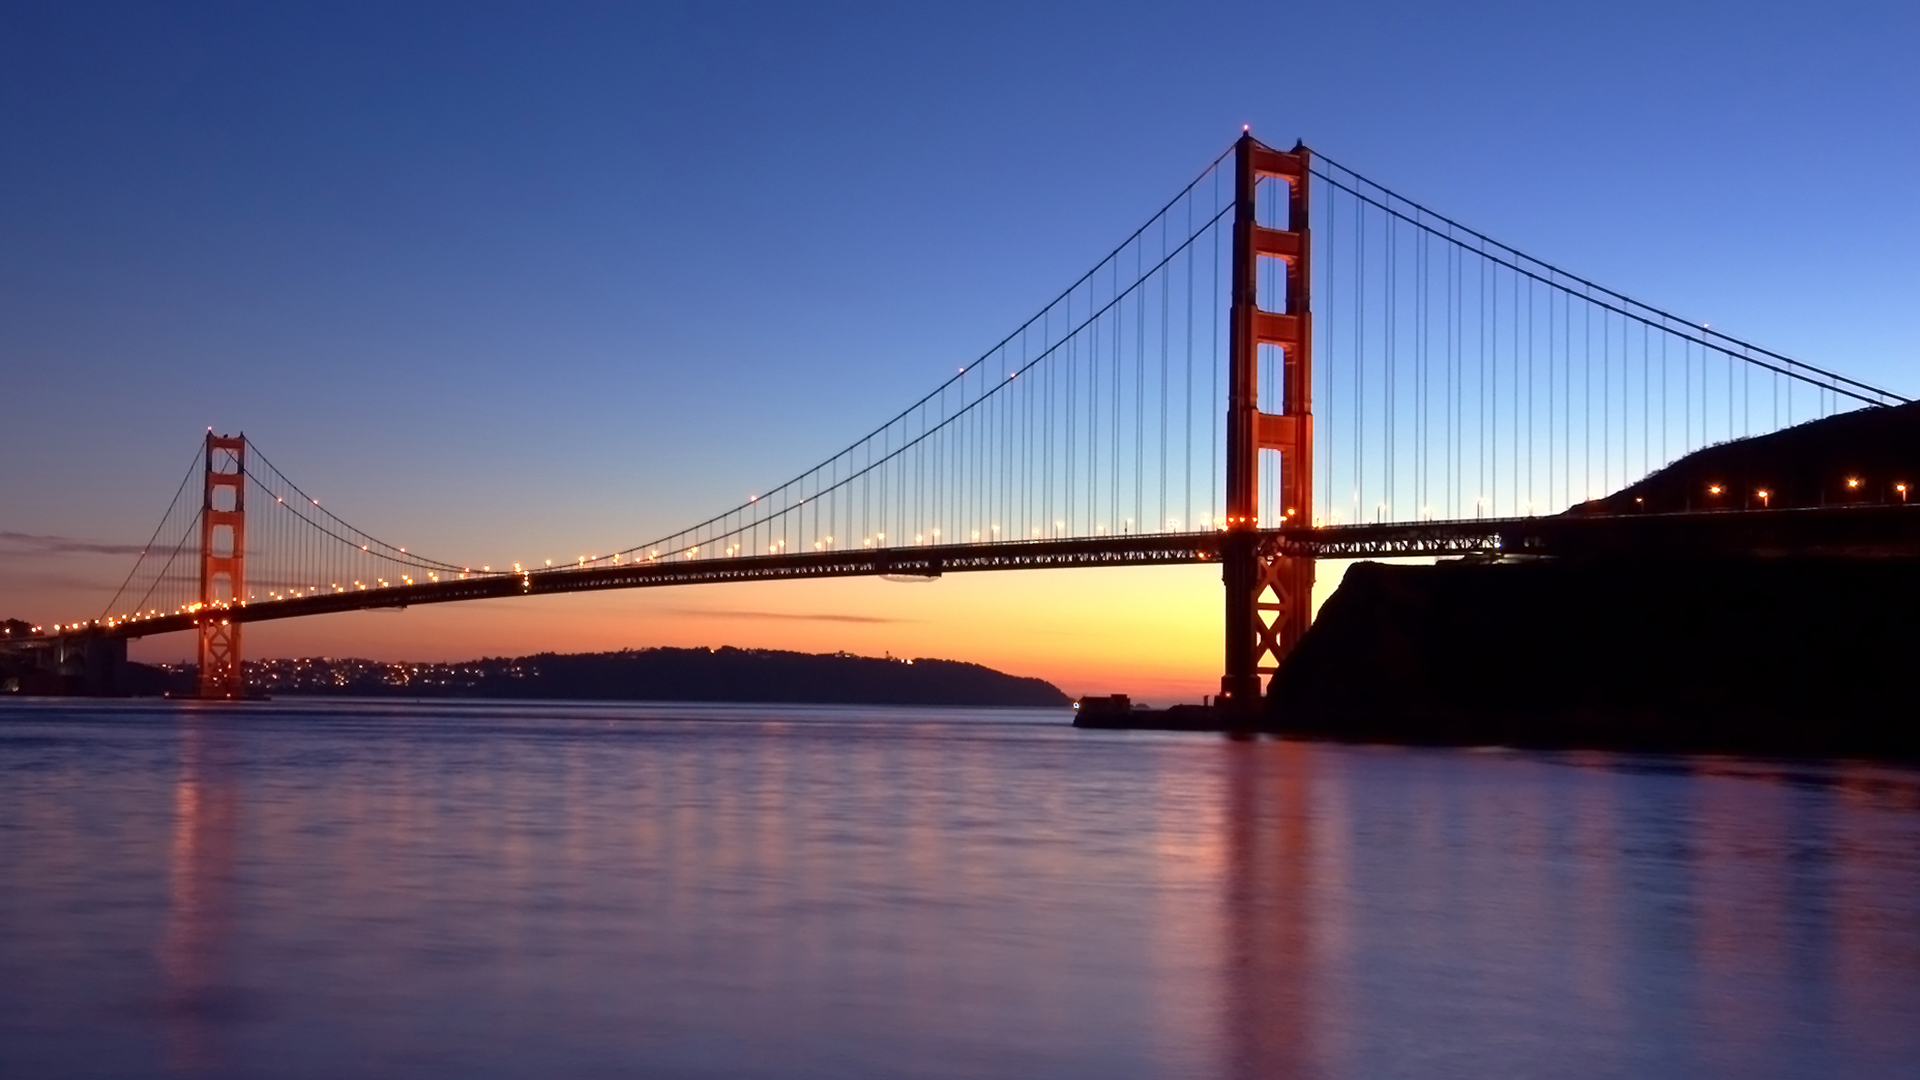 sunset bridge wallpaper 1920x1080